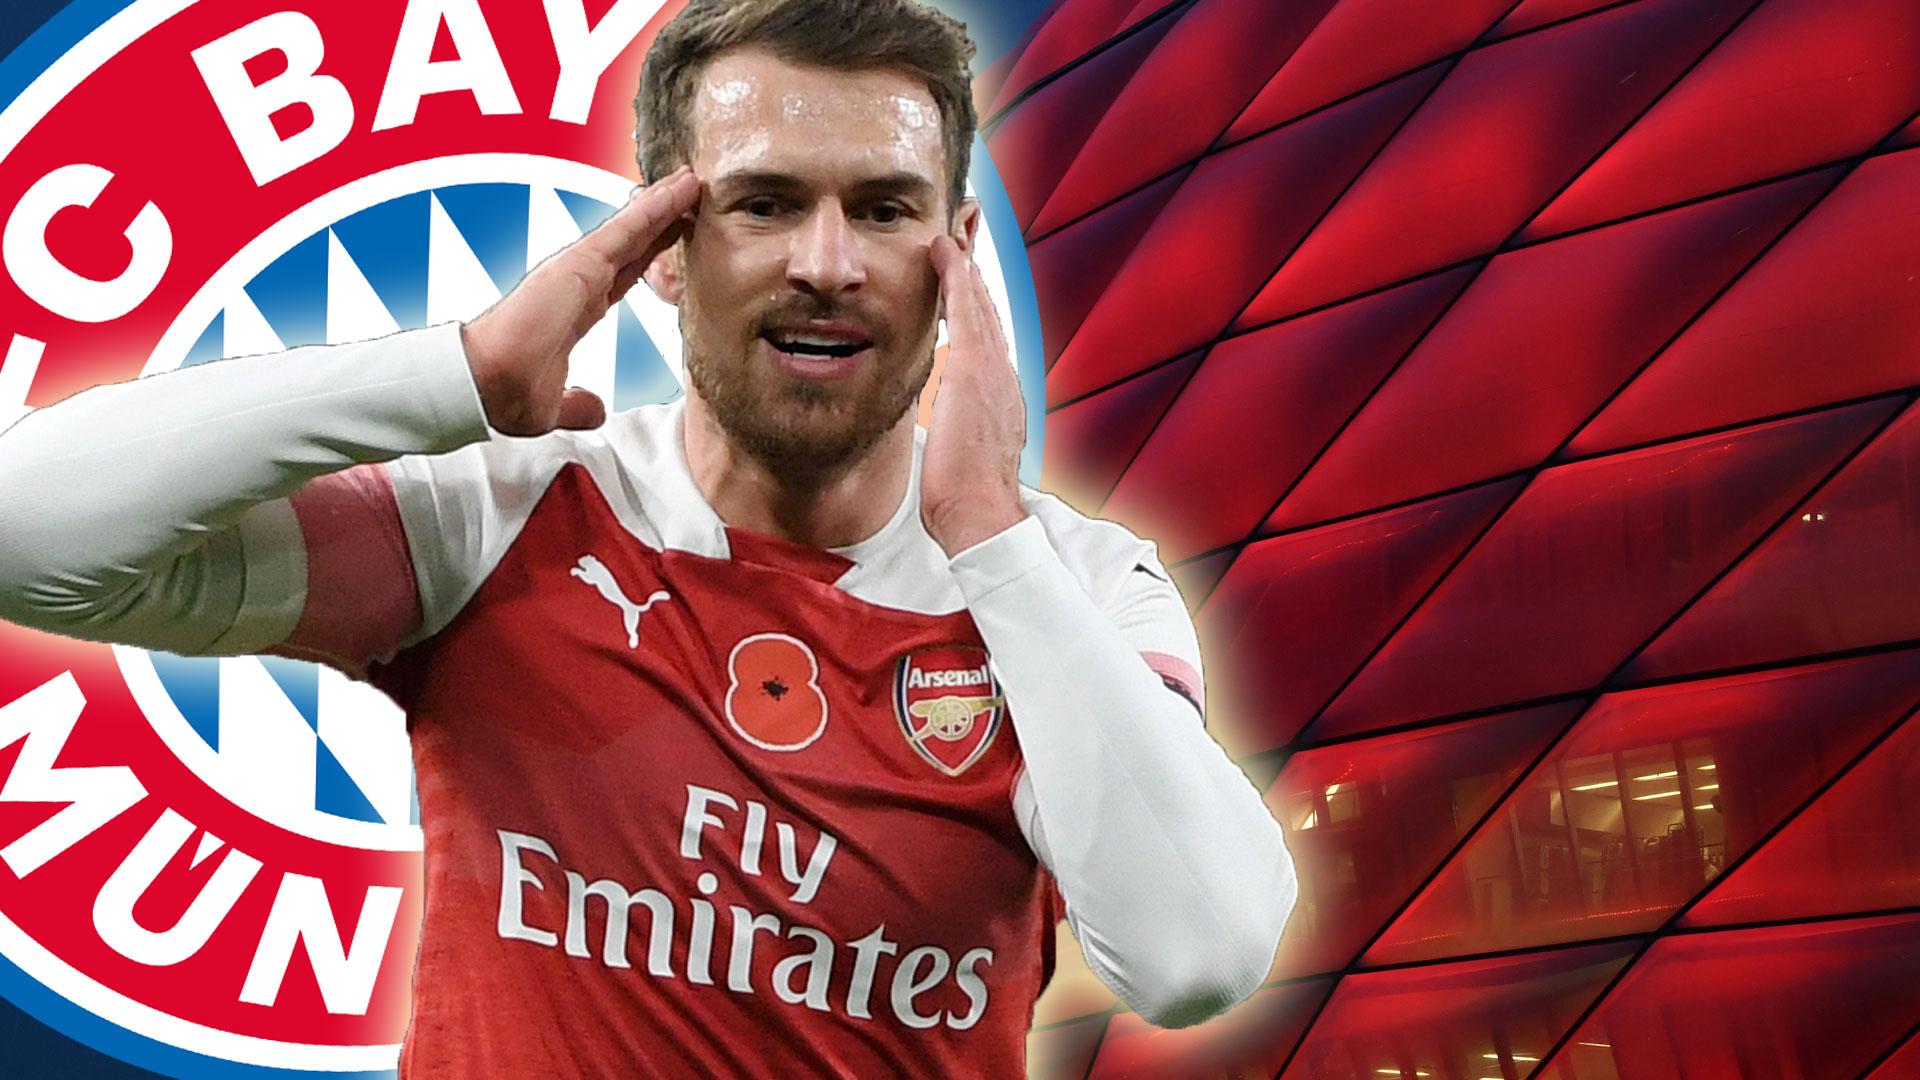 GFX Aaron Ramsey Bayern